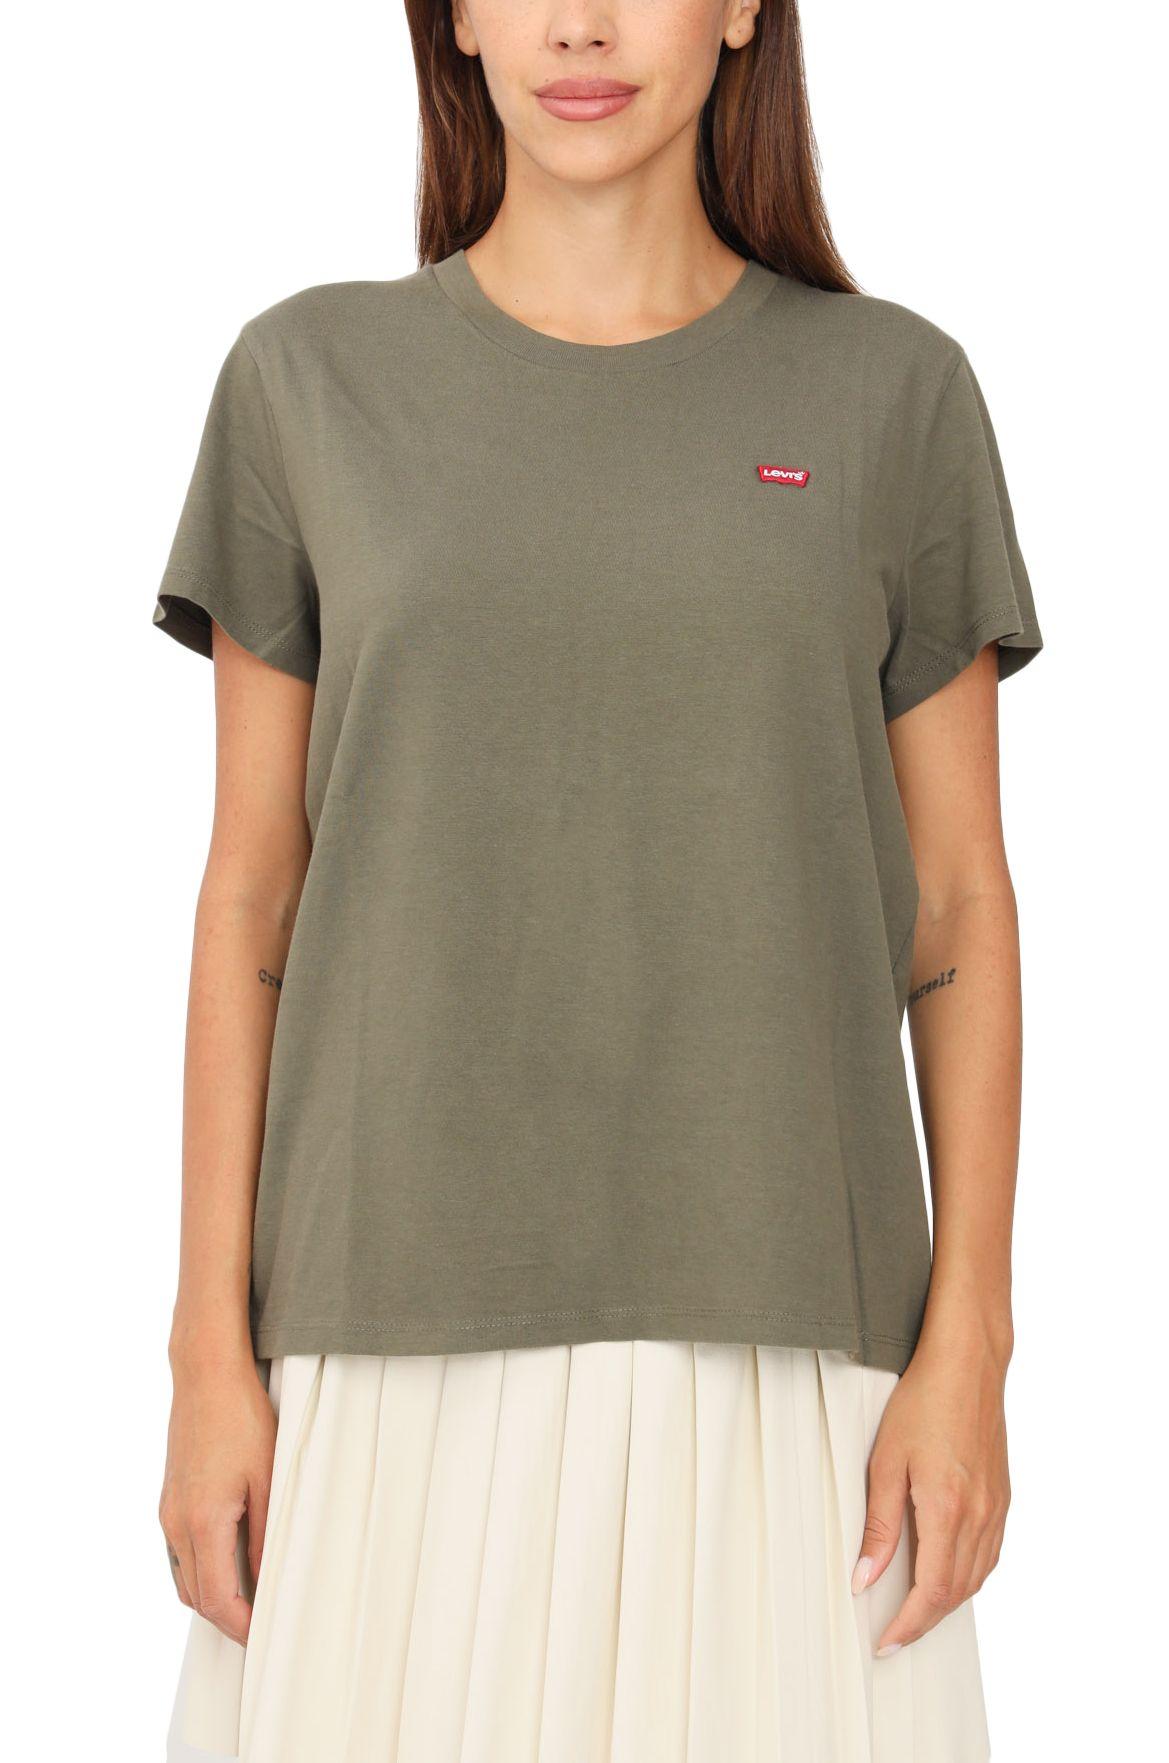 Levis T-Shirt PERFECT TEE Sea Turtle